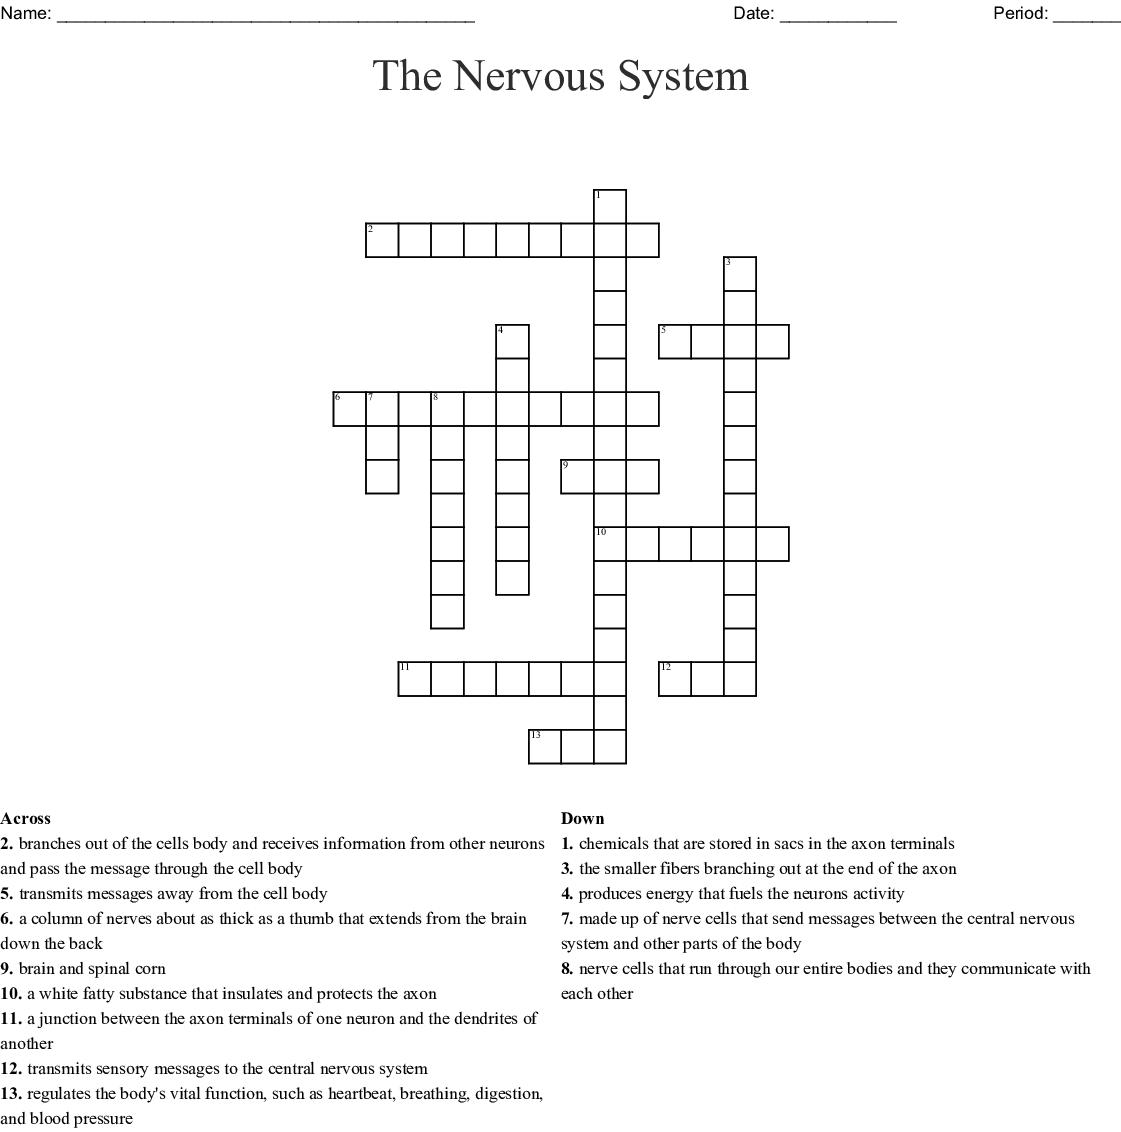 Anatomy The Nervous System Crossword